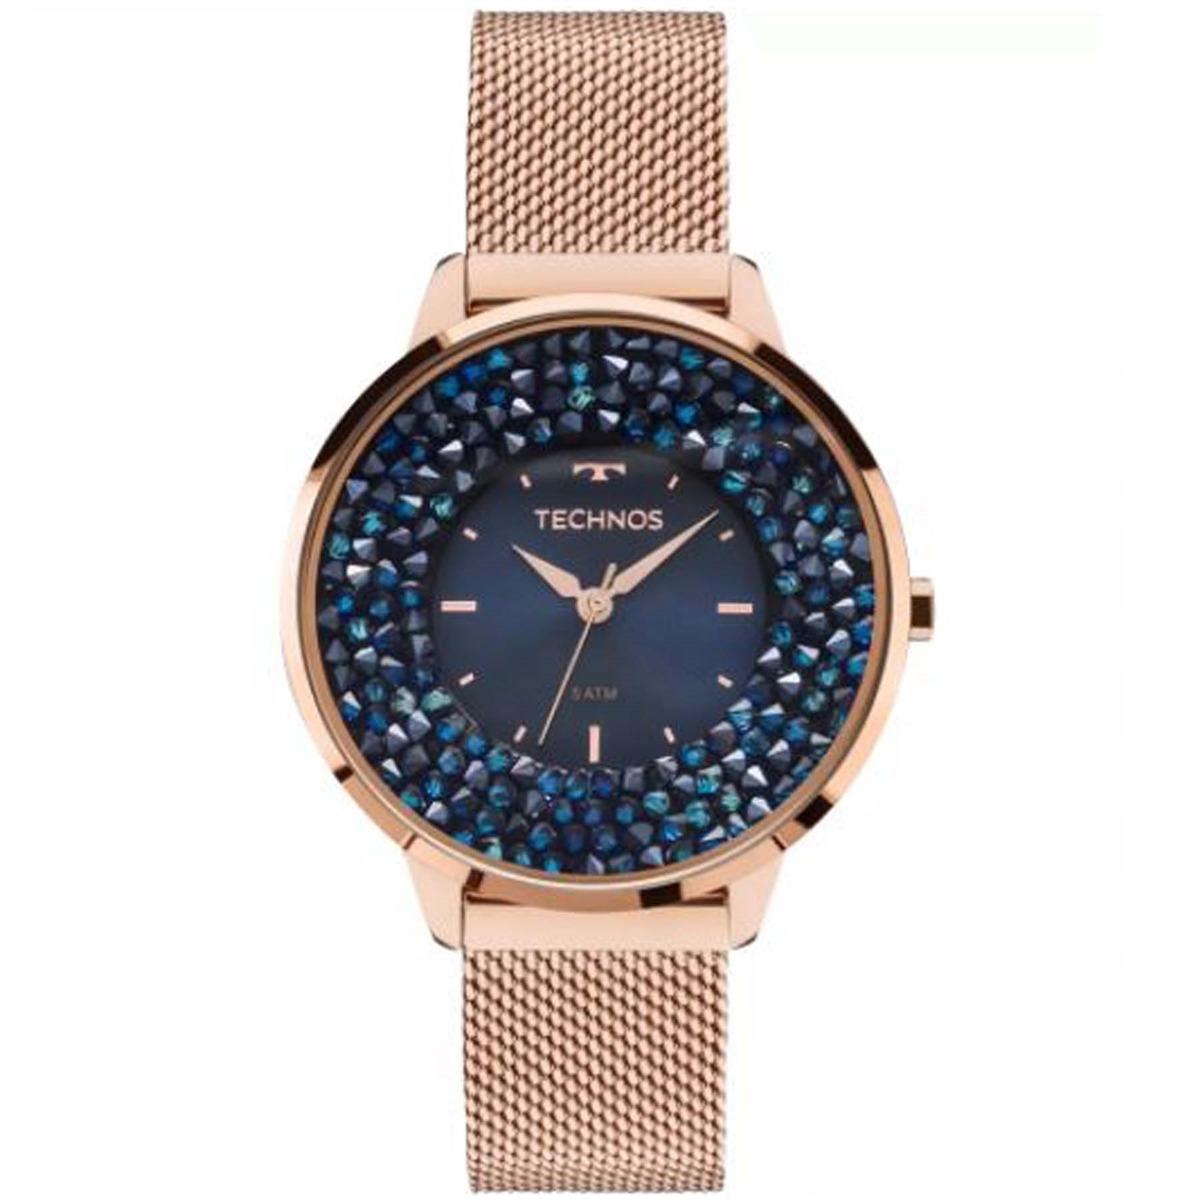 relógio technos swarovski elegance analógico feminino 2035ml. Carregando  zoom. 0b0ffa40a6